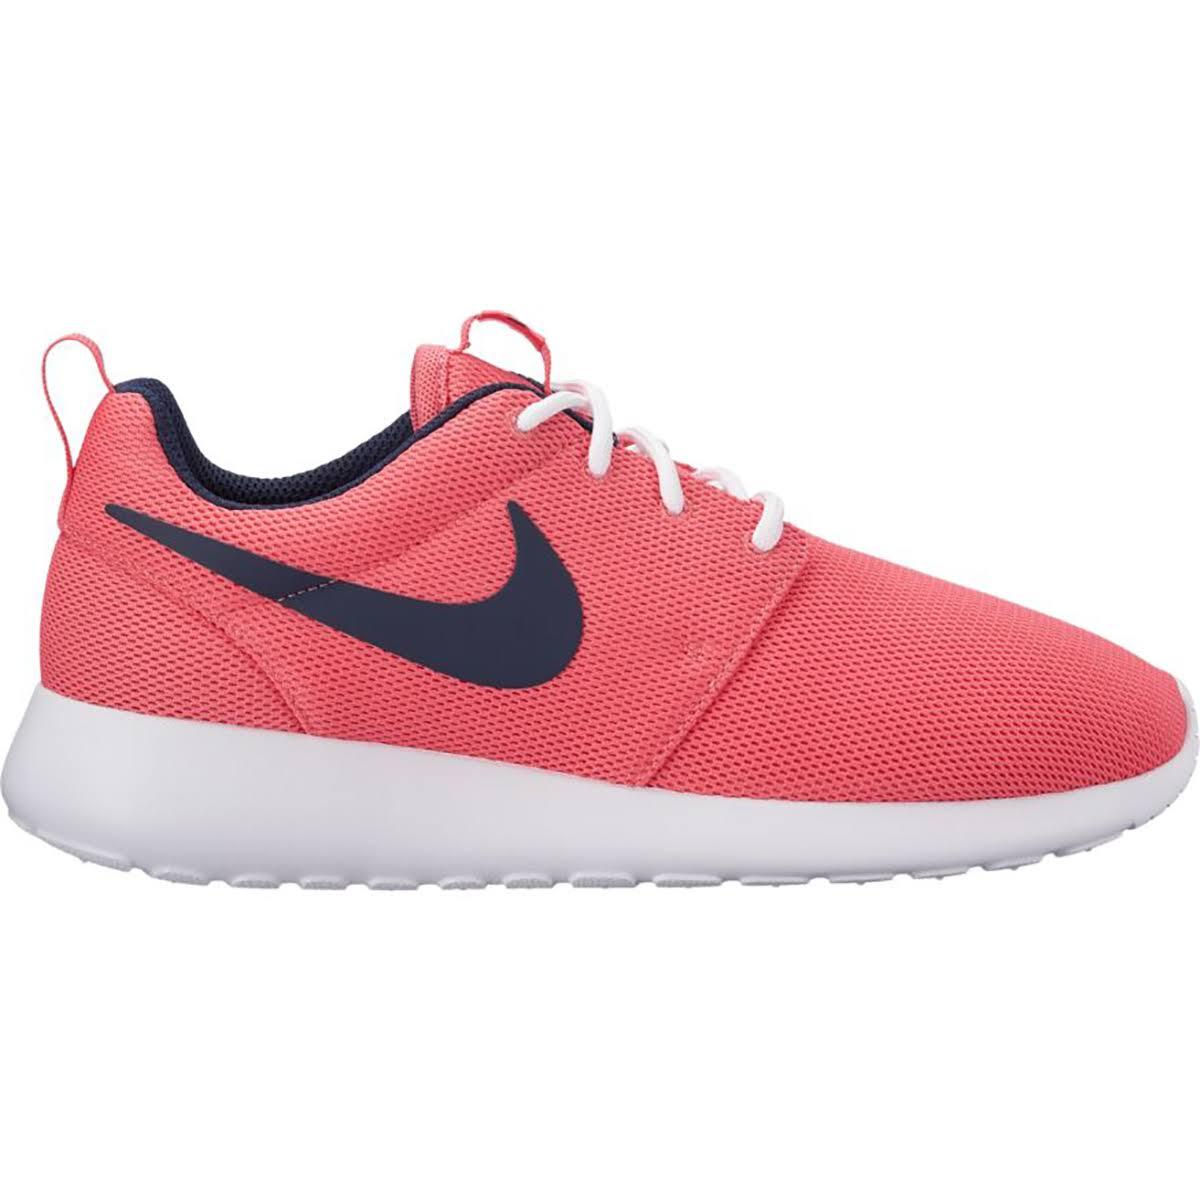 Scarpe 8 donna misura One Roshe Nike 5corallo marino 4A5RjL